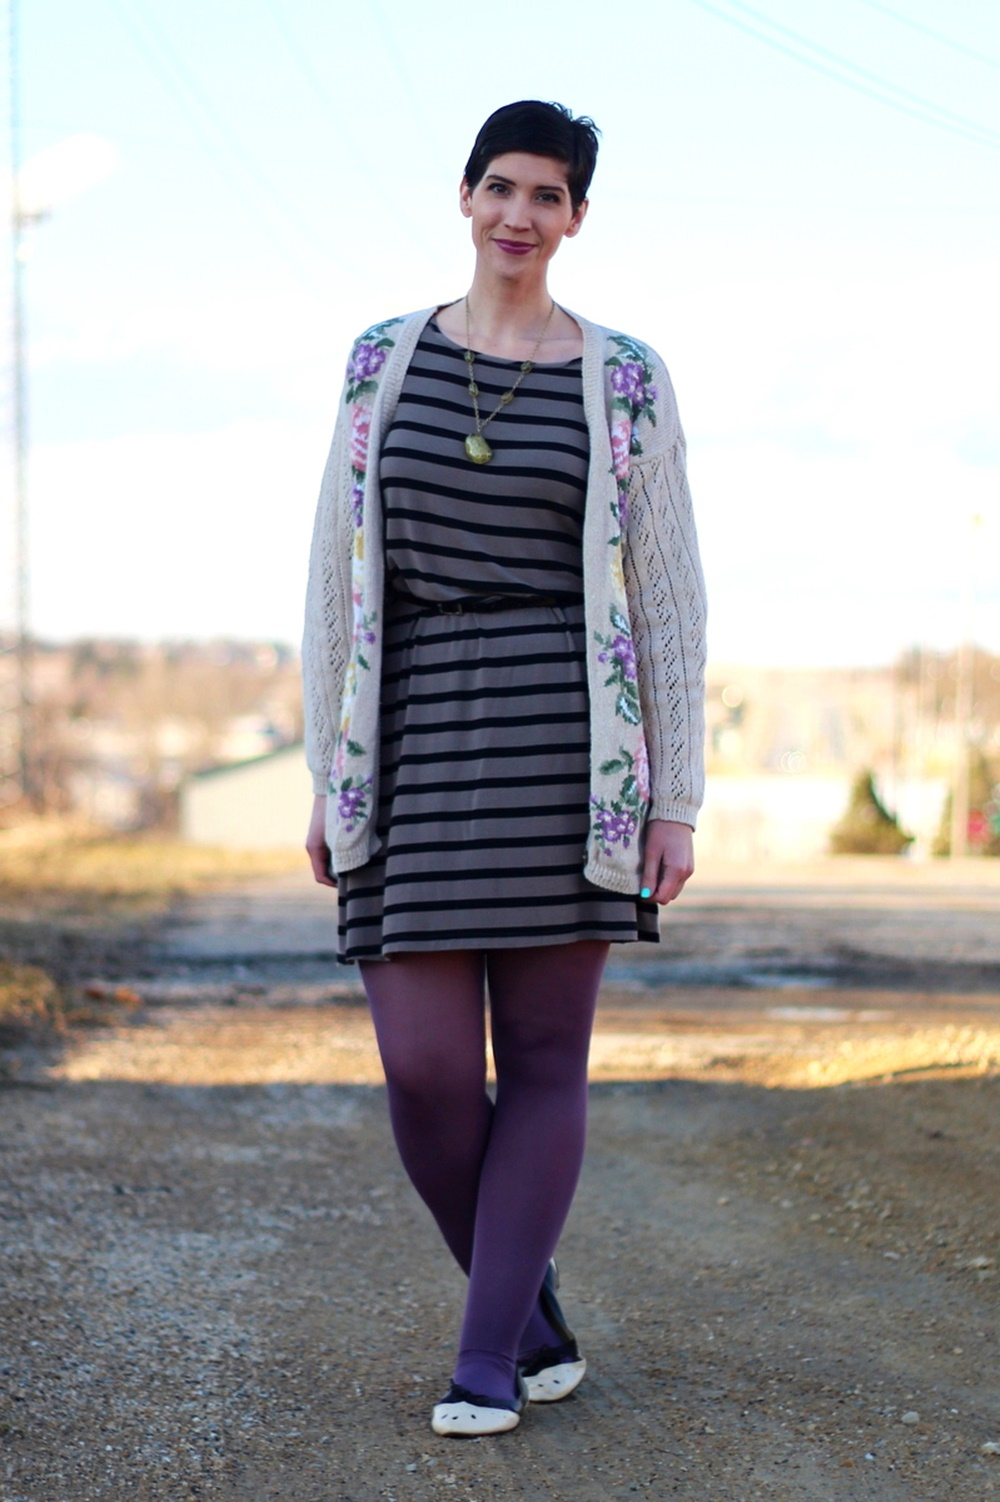 Embroidered grandma cardigan, striped dress, purple lipstick, We Love Colors Mocha tights, brown cream ballet flats